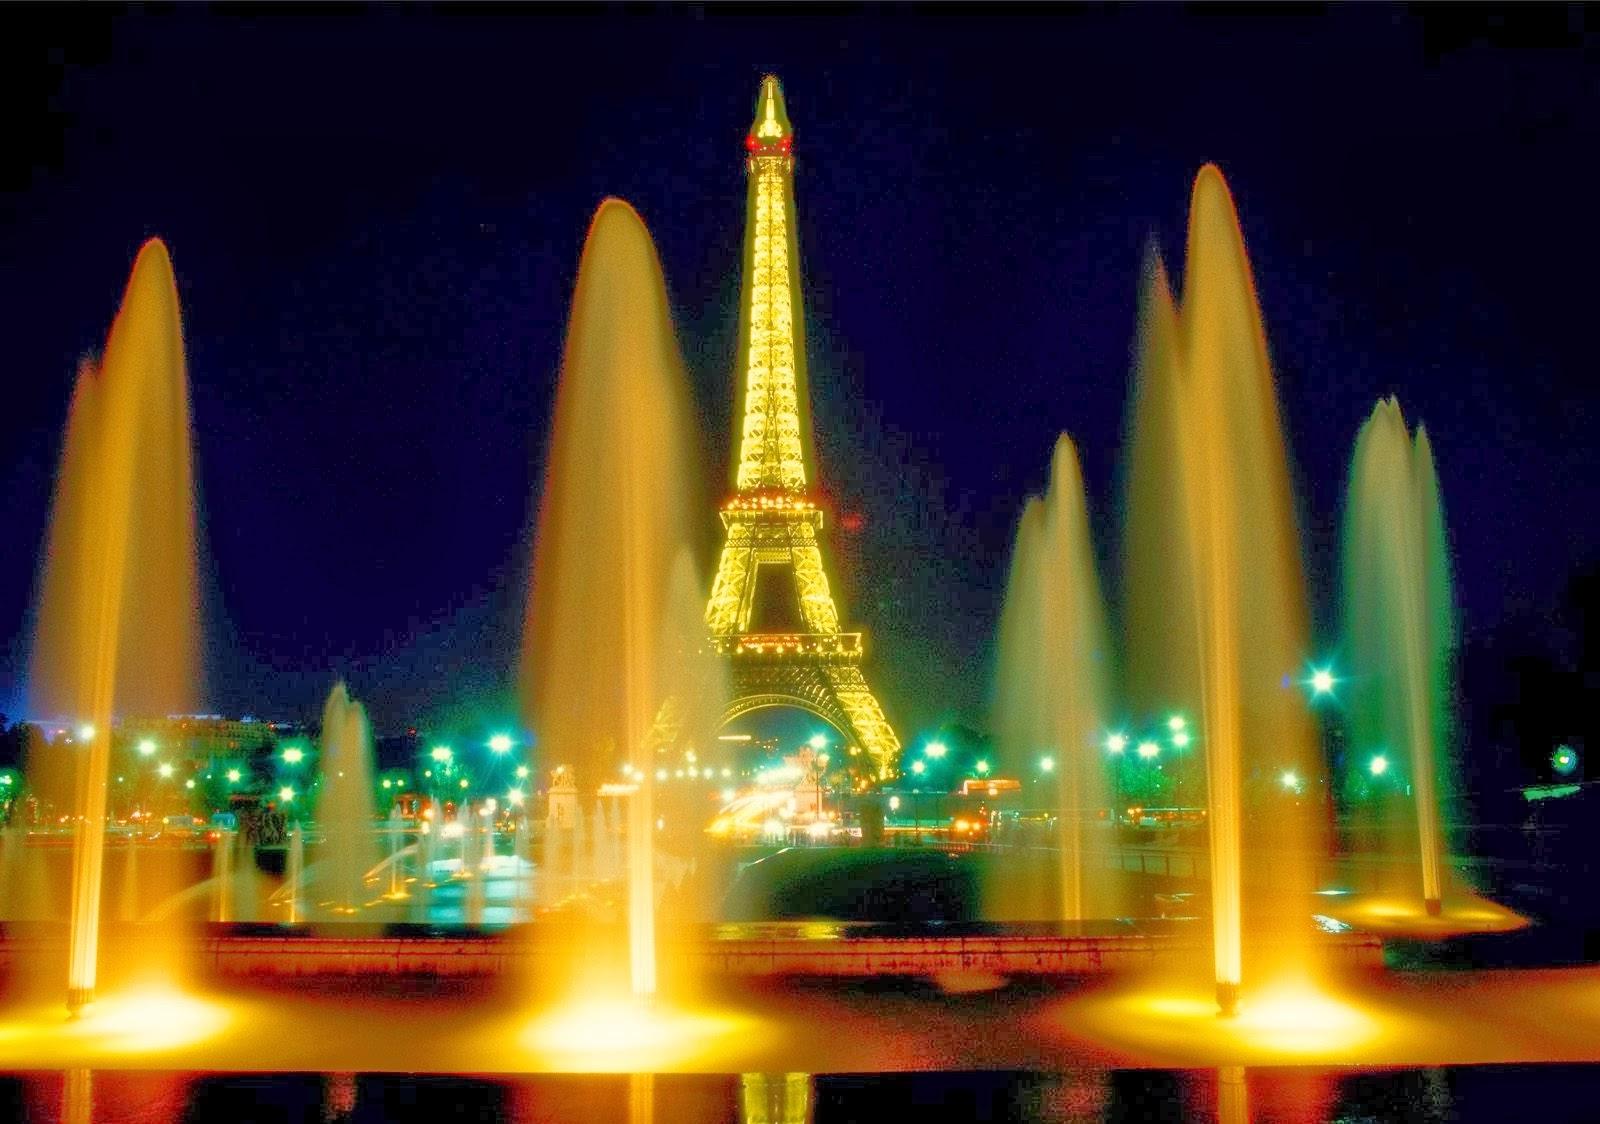 Eiffel Tower HD Wallpaper & Backgrounds Download